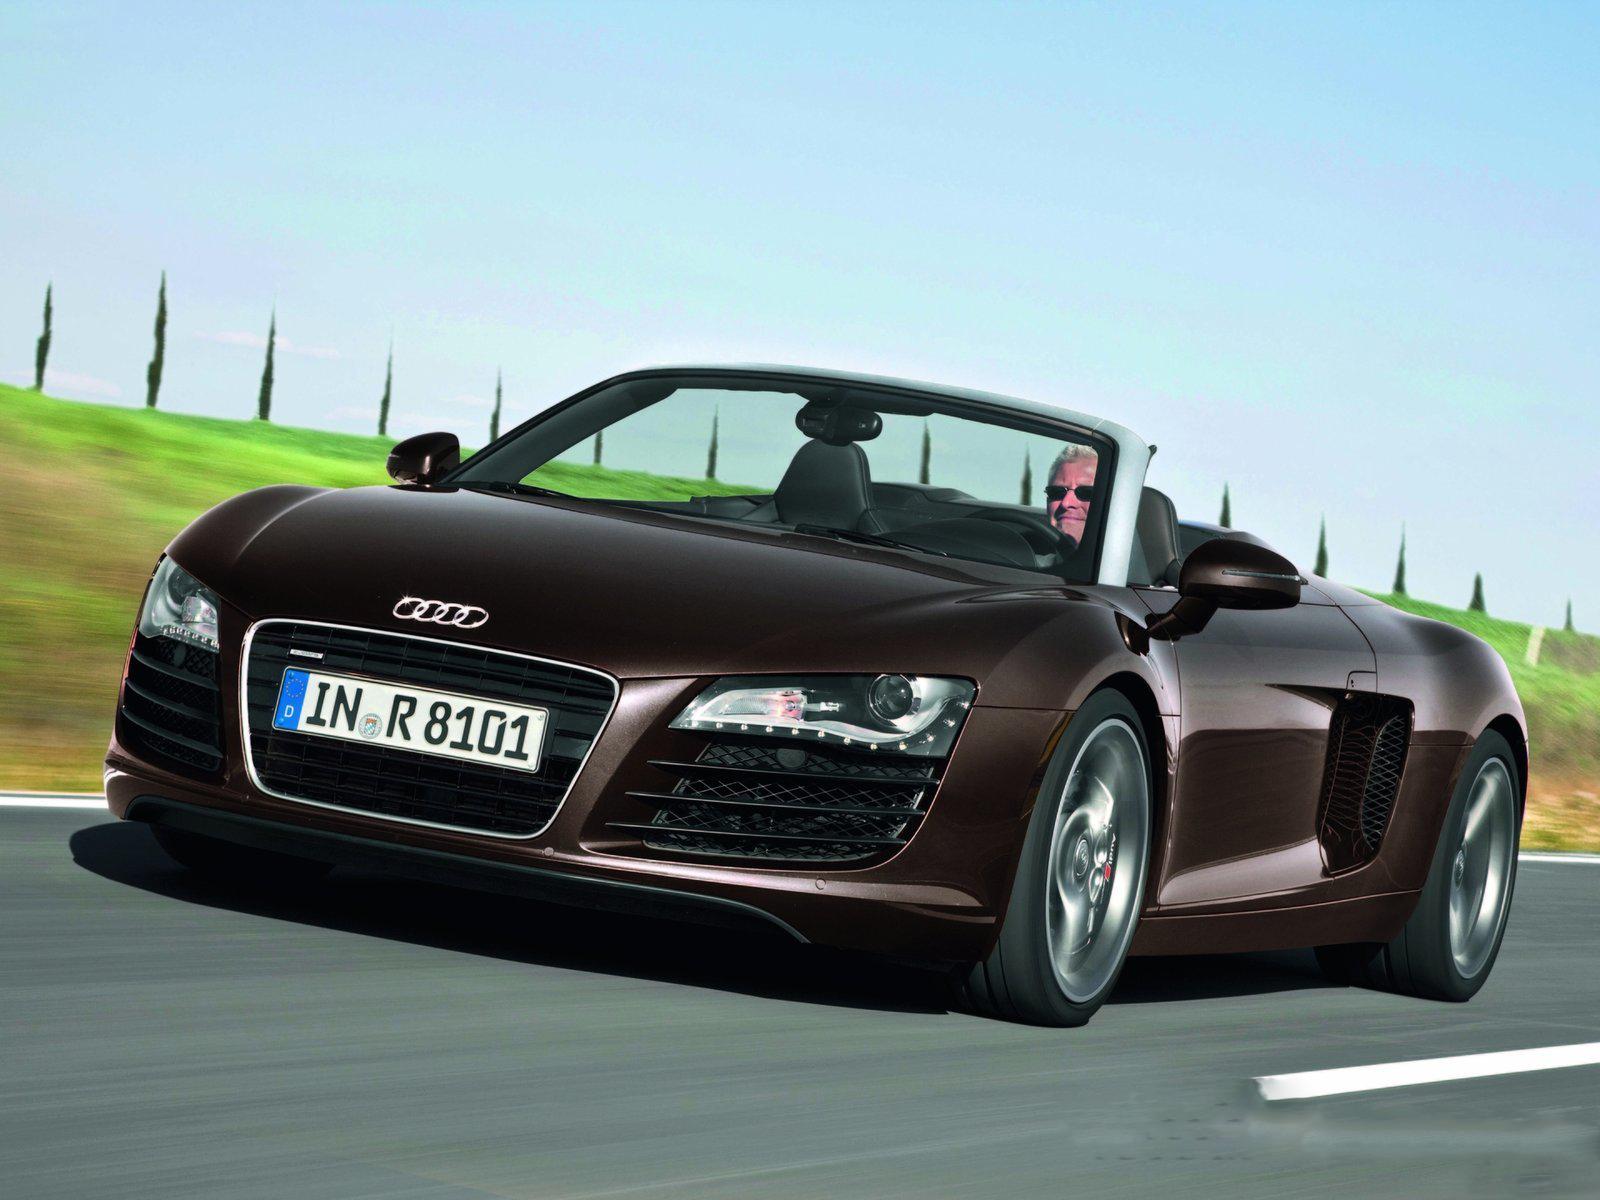 Audi r8 spyder 4 2 fsi quattro front view